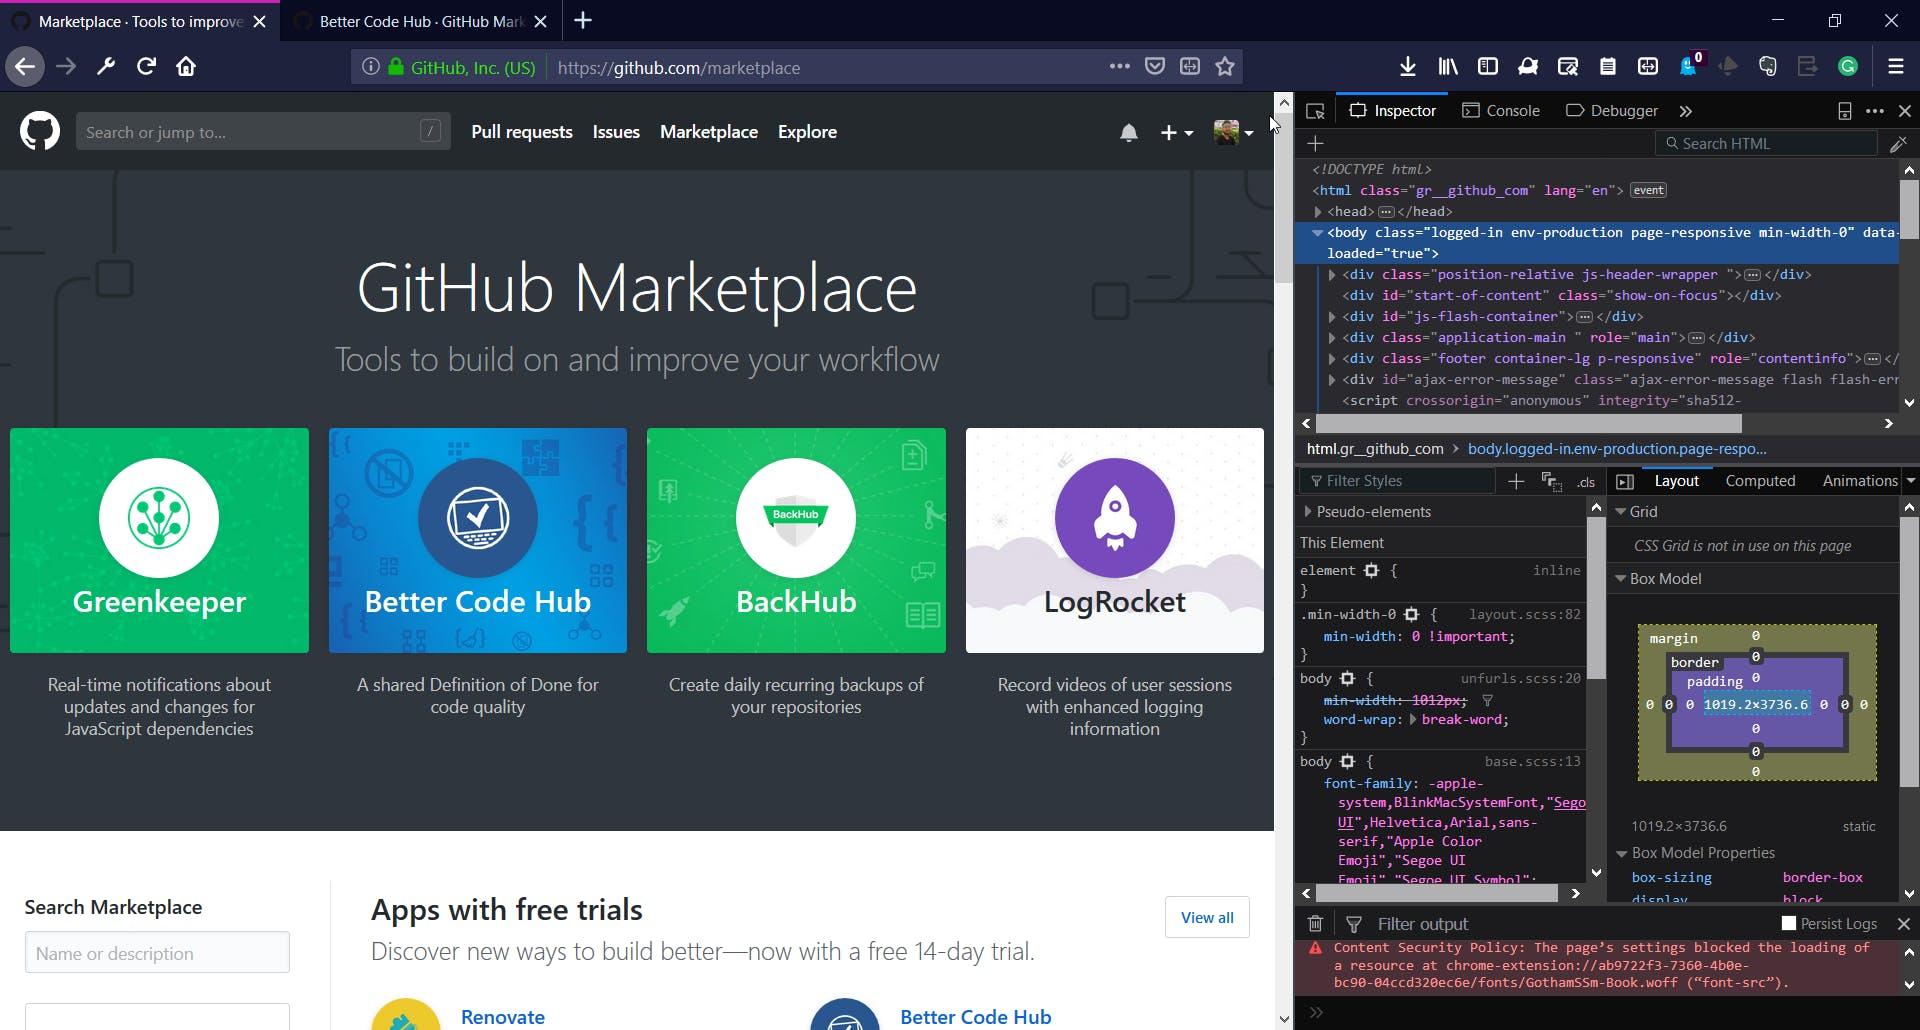 A look at Firefox's DevTools